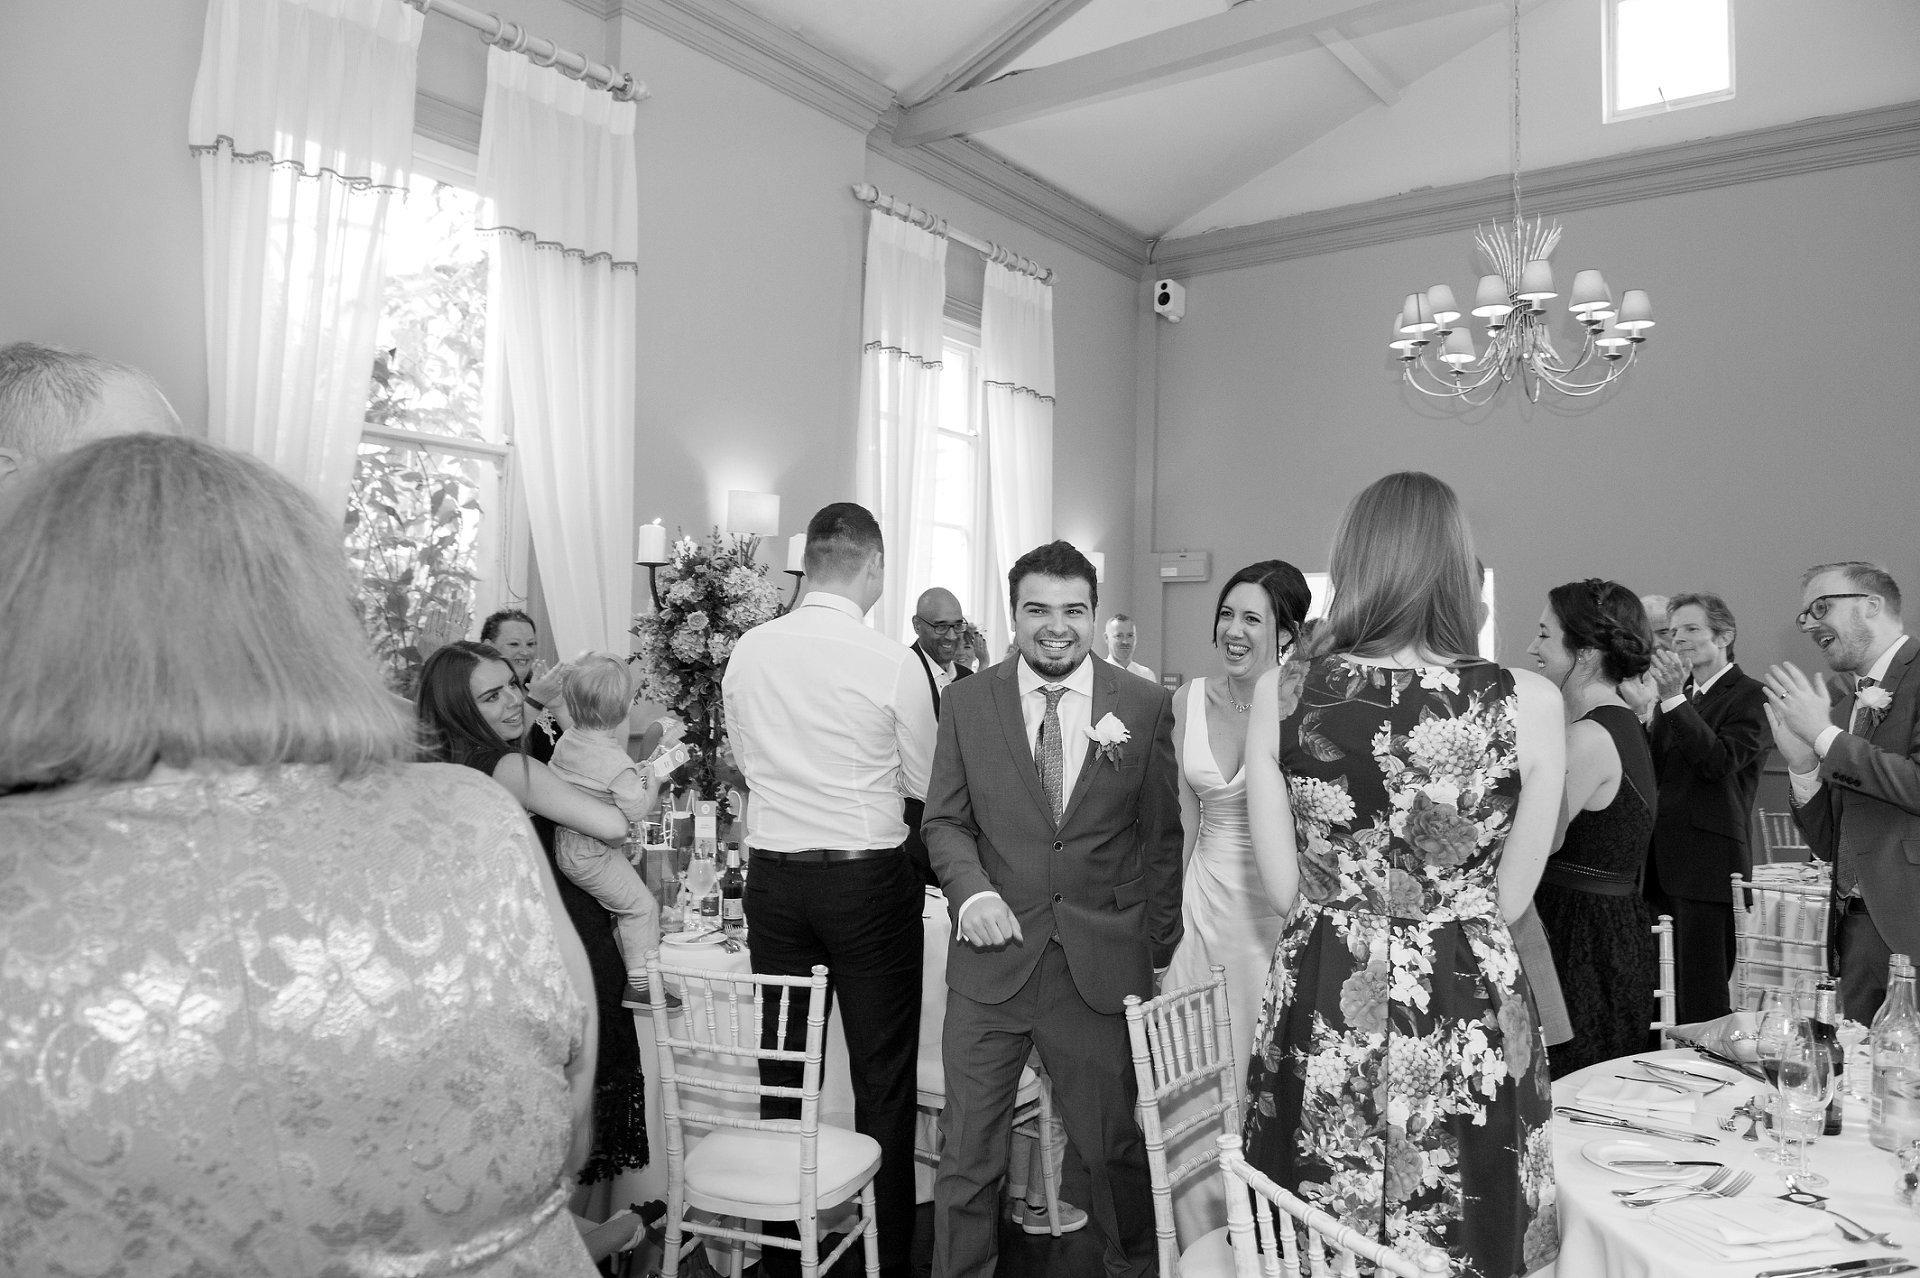 Bride & Groom enter teh Mulberry Room in Morden Hall for their wedding breakfast